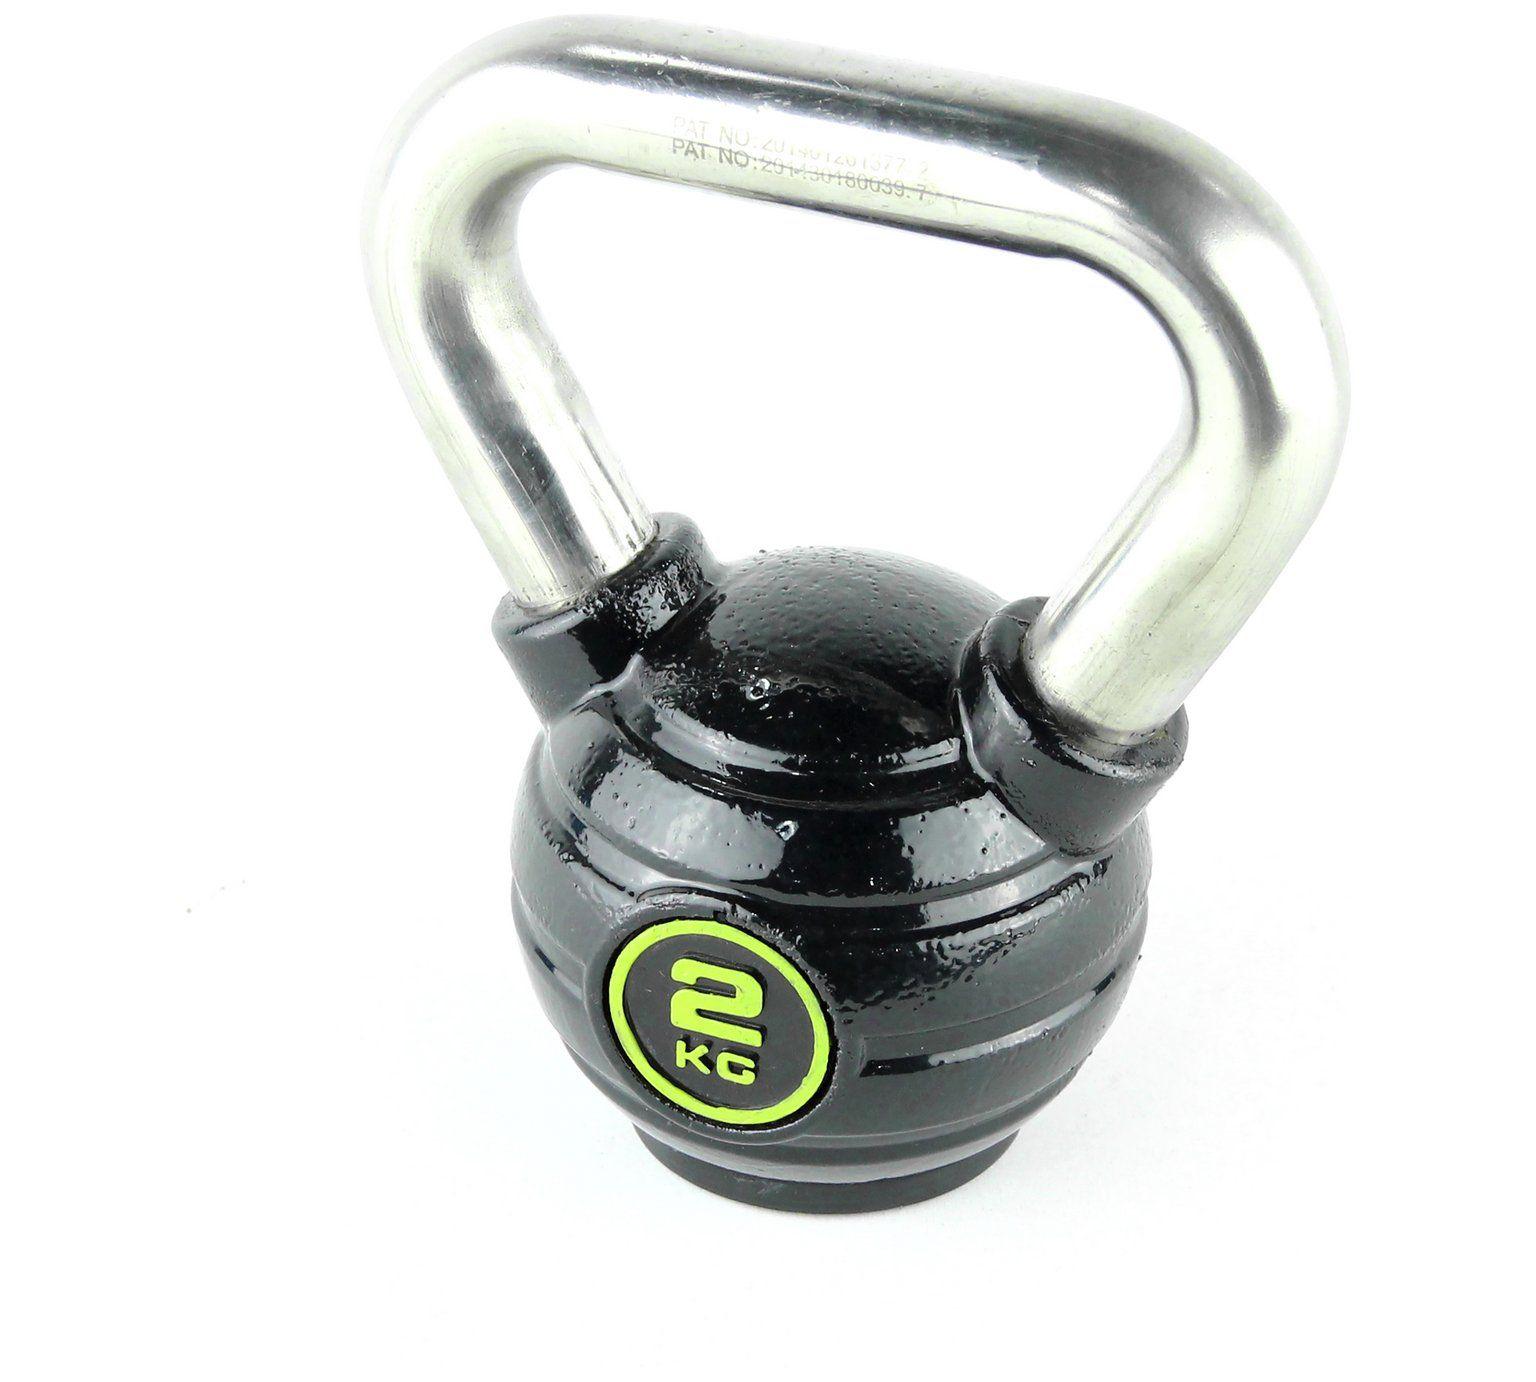 Opti Kettlebell - 2kg Iron with s/steel handle  £4.99 @ Argos